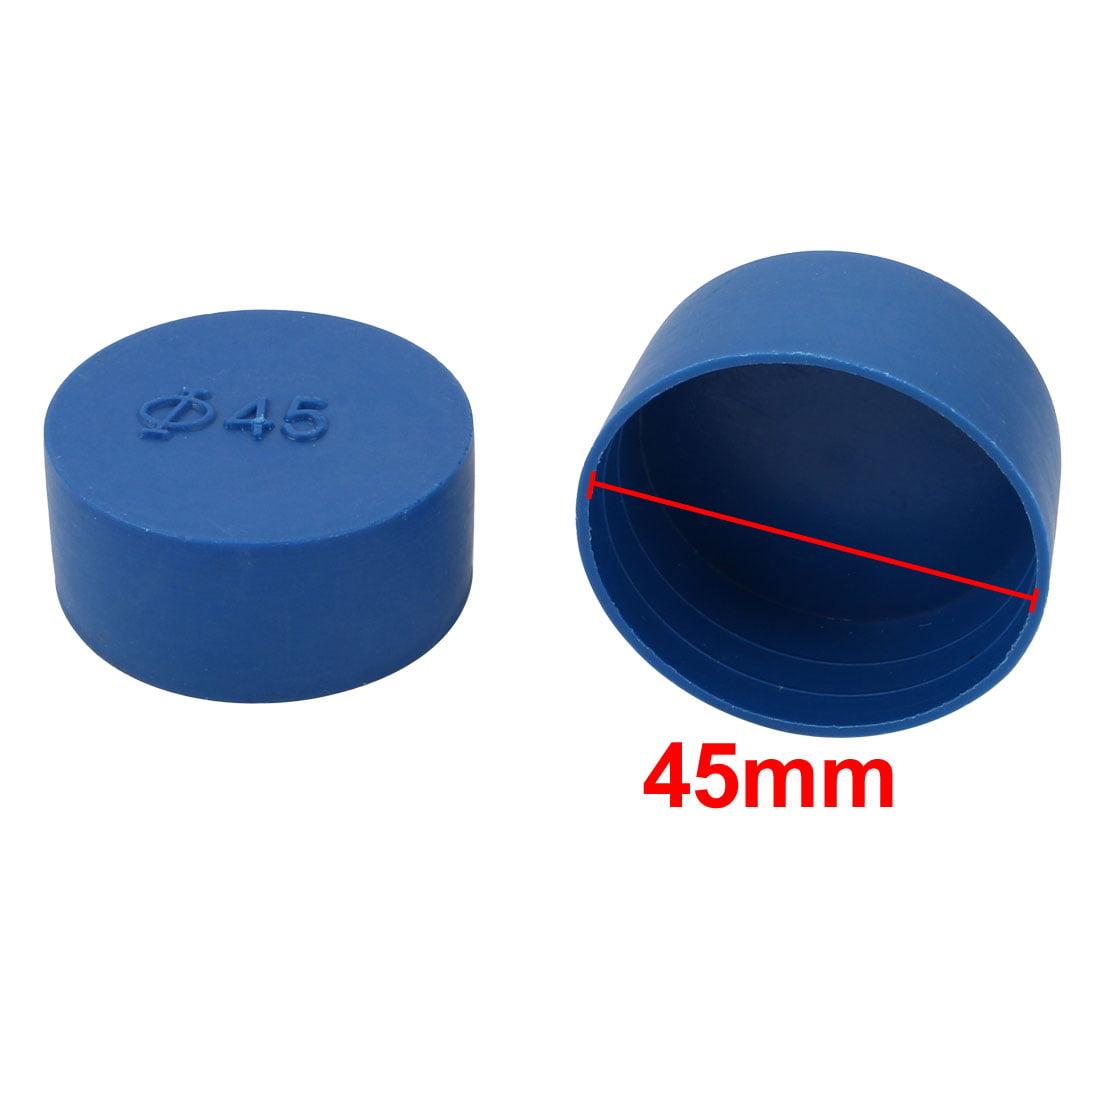 12pcs 45mm Inner Dia PE Plastic End Cap Bolt Thread Protector Tube Cover Blue - image 1 of 2